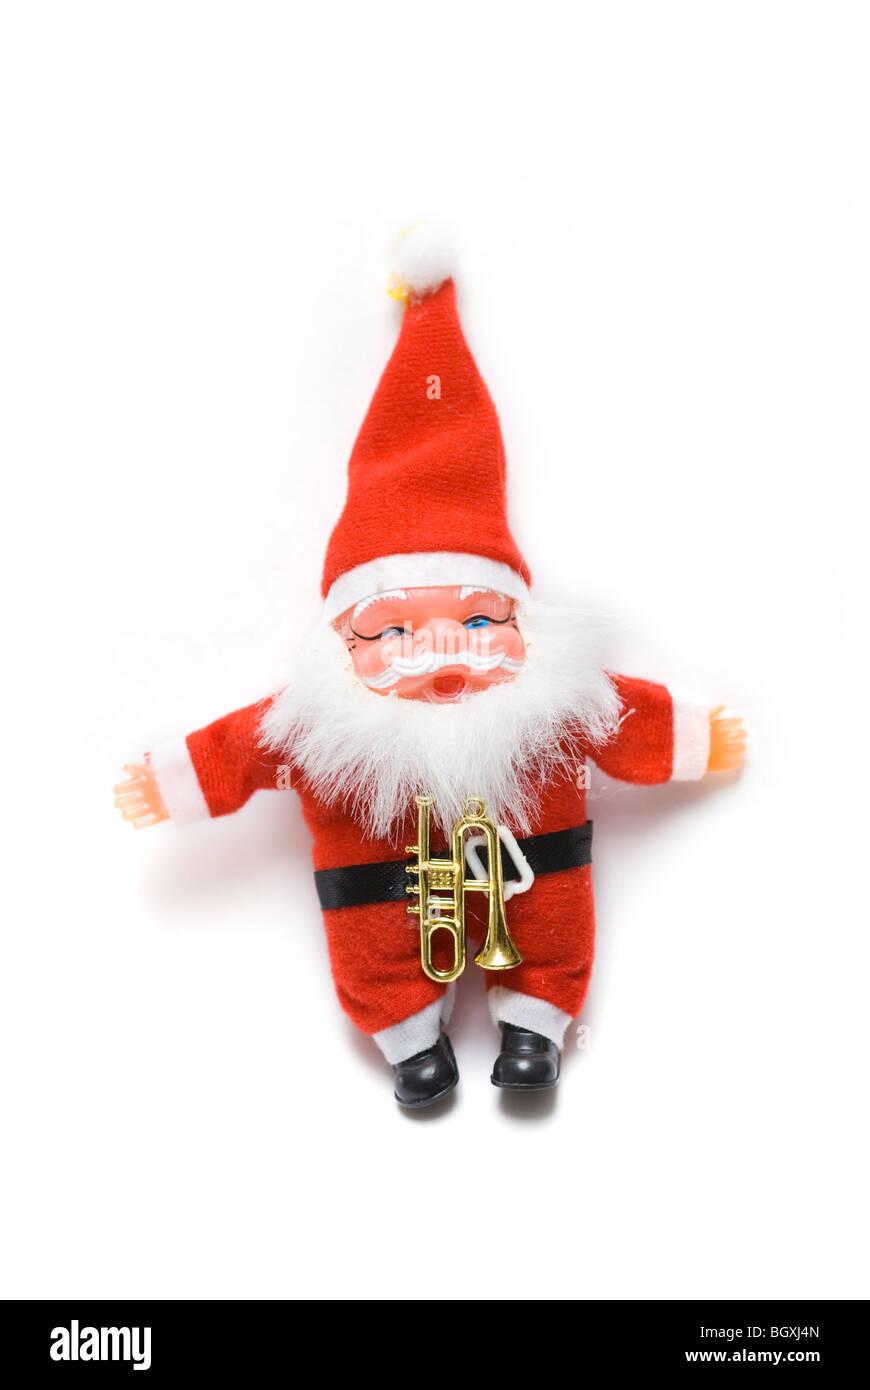 Santa Claus aislado sobre fondo blanco Imagen De Stock